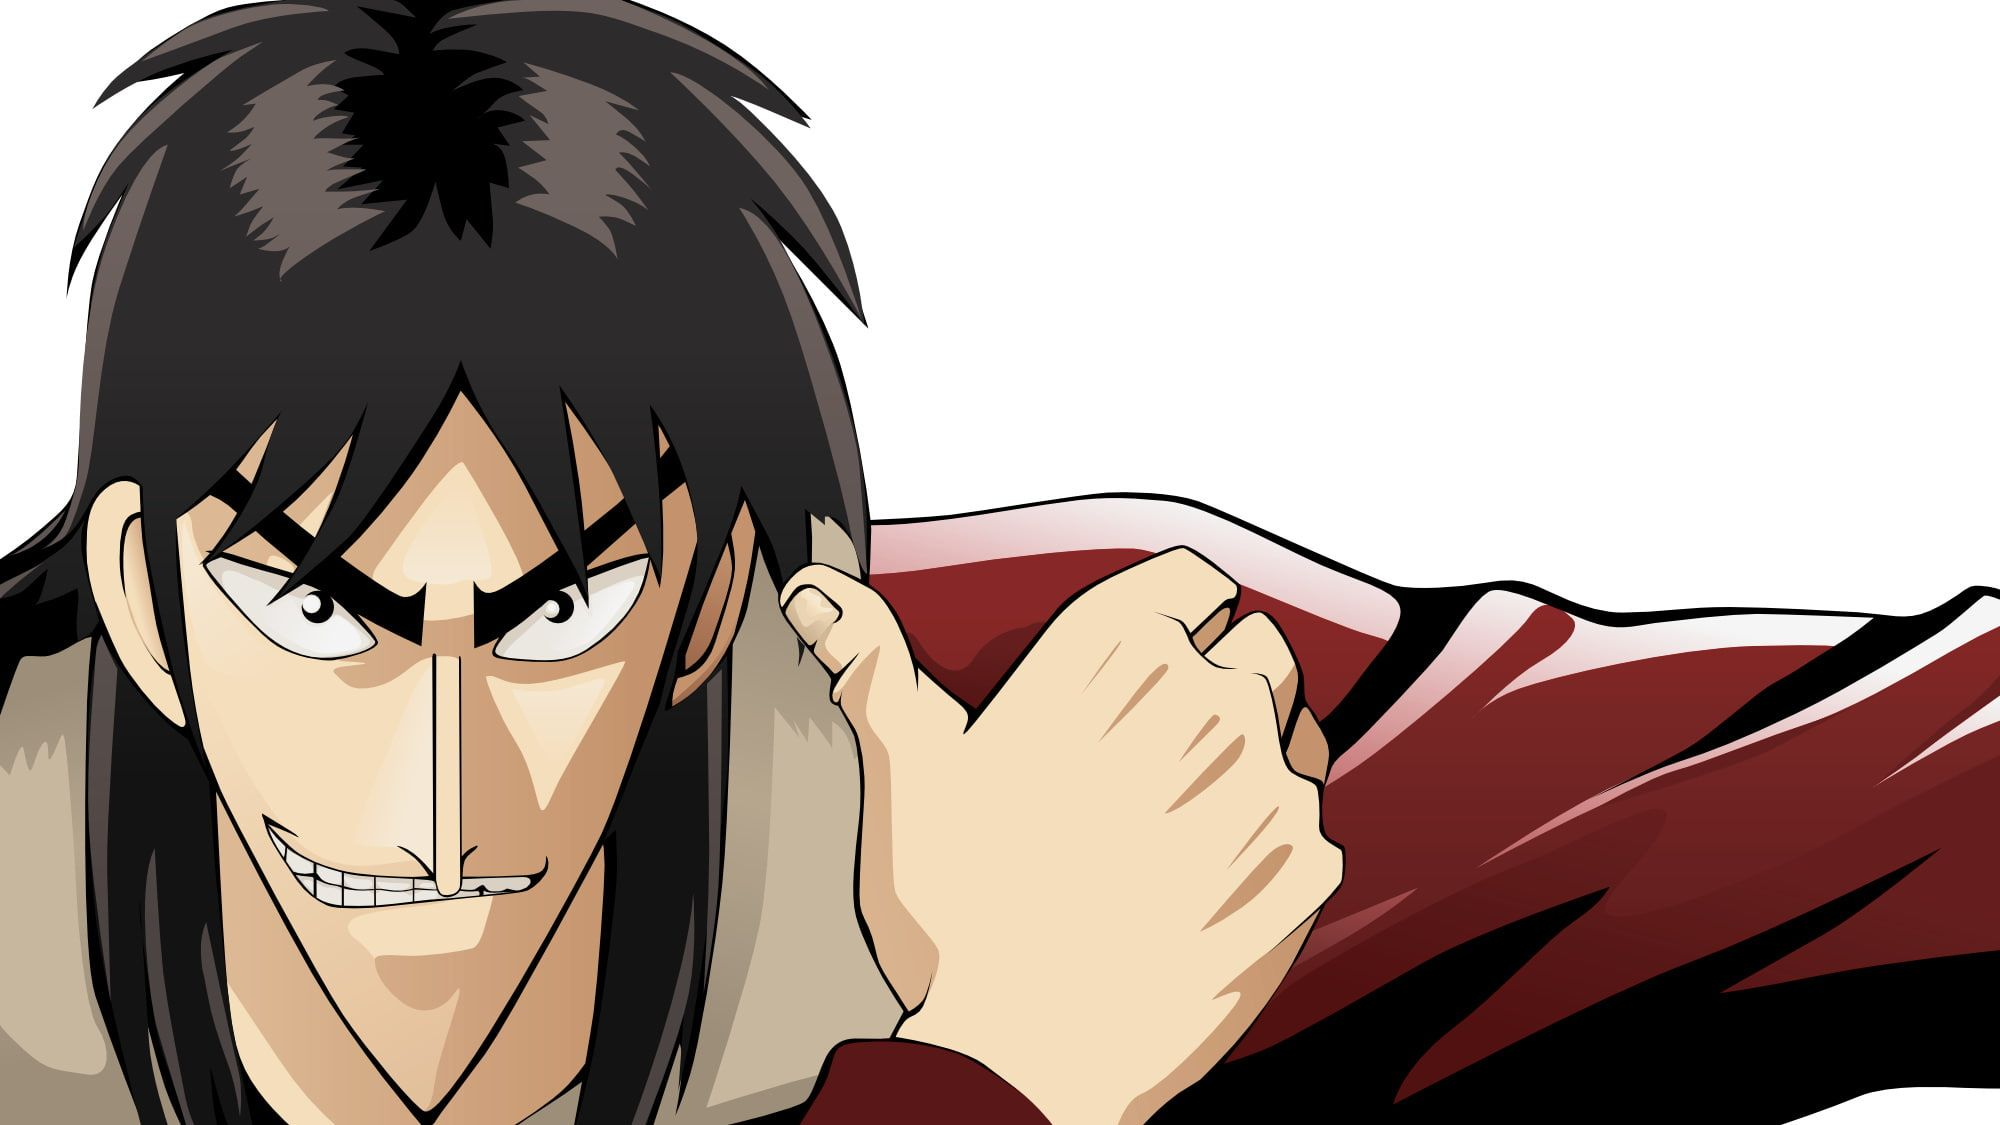 Anime Kaiji Kaiji Itou 1080p Wallpaper Hdwallpaper Desktop Anime Hd Wallpaper Wallpaper